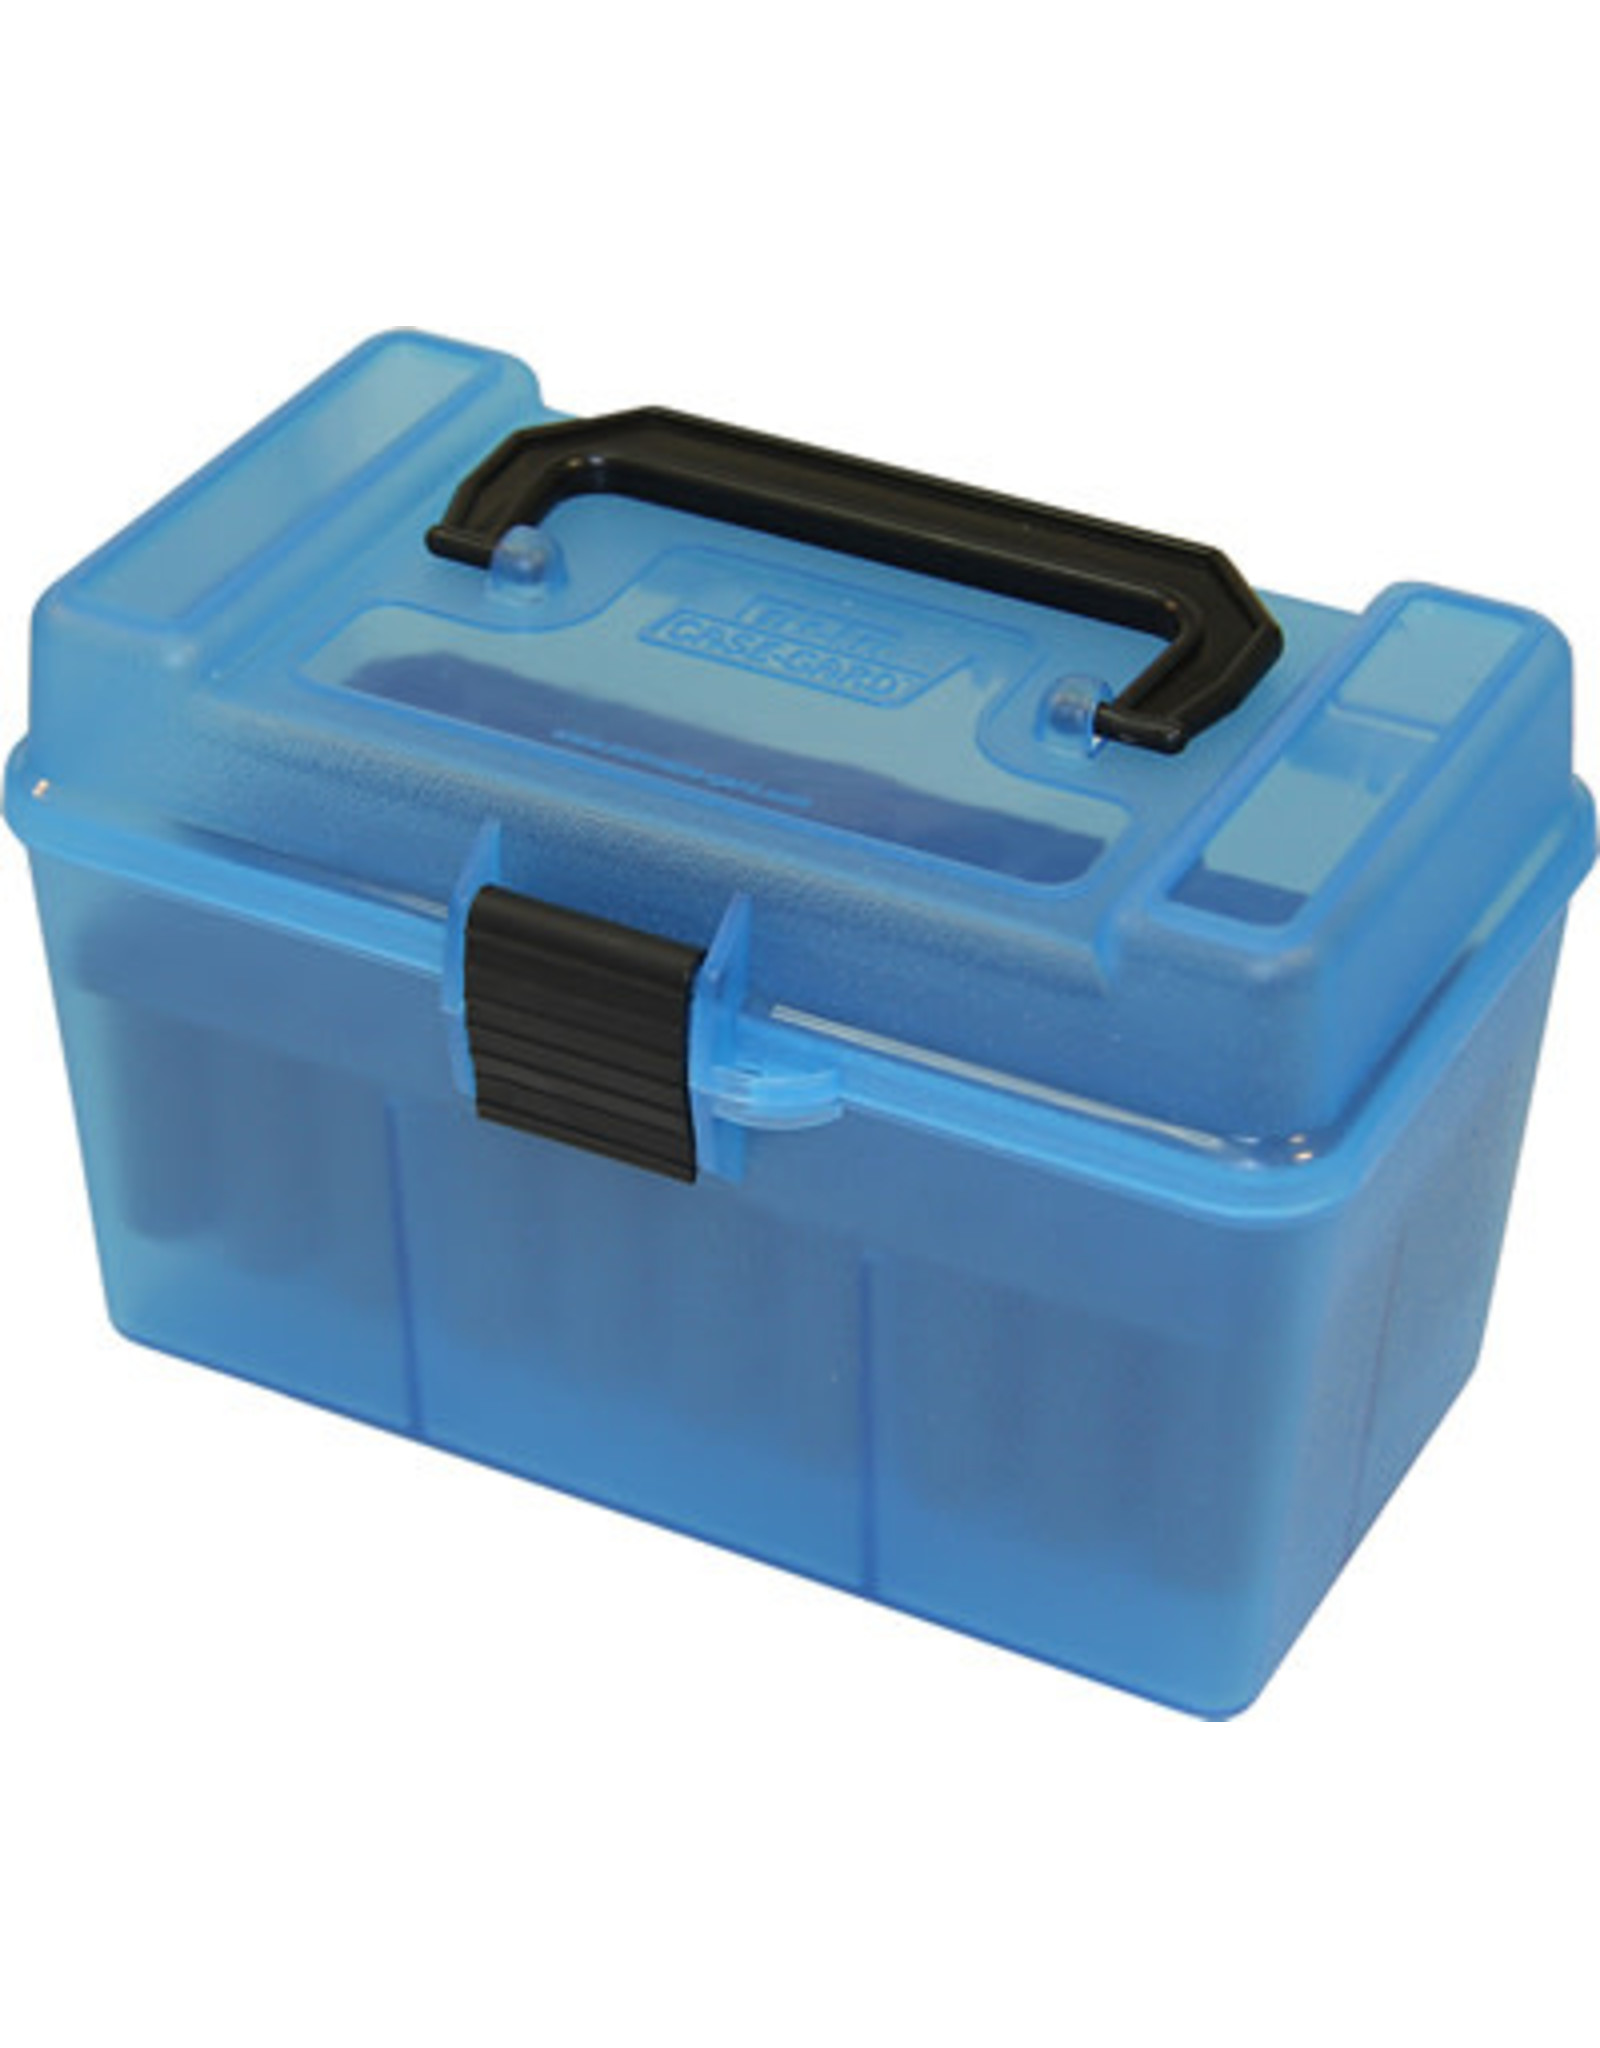 MTM Case-Gard MTM H50-RL-24 Deluxe Ammo Box